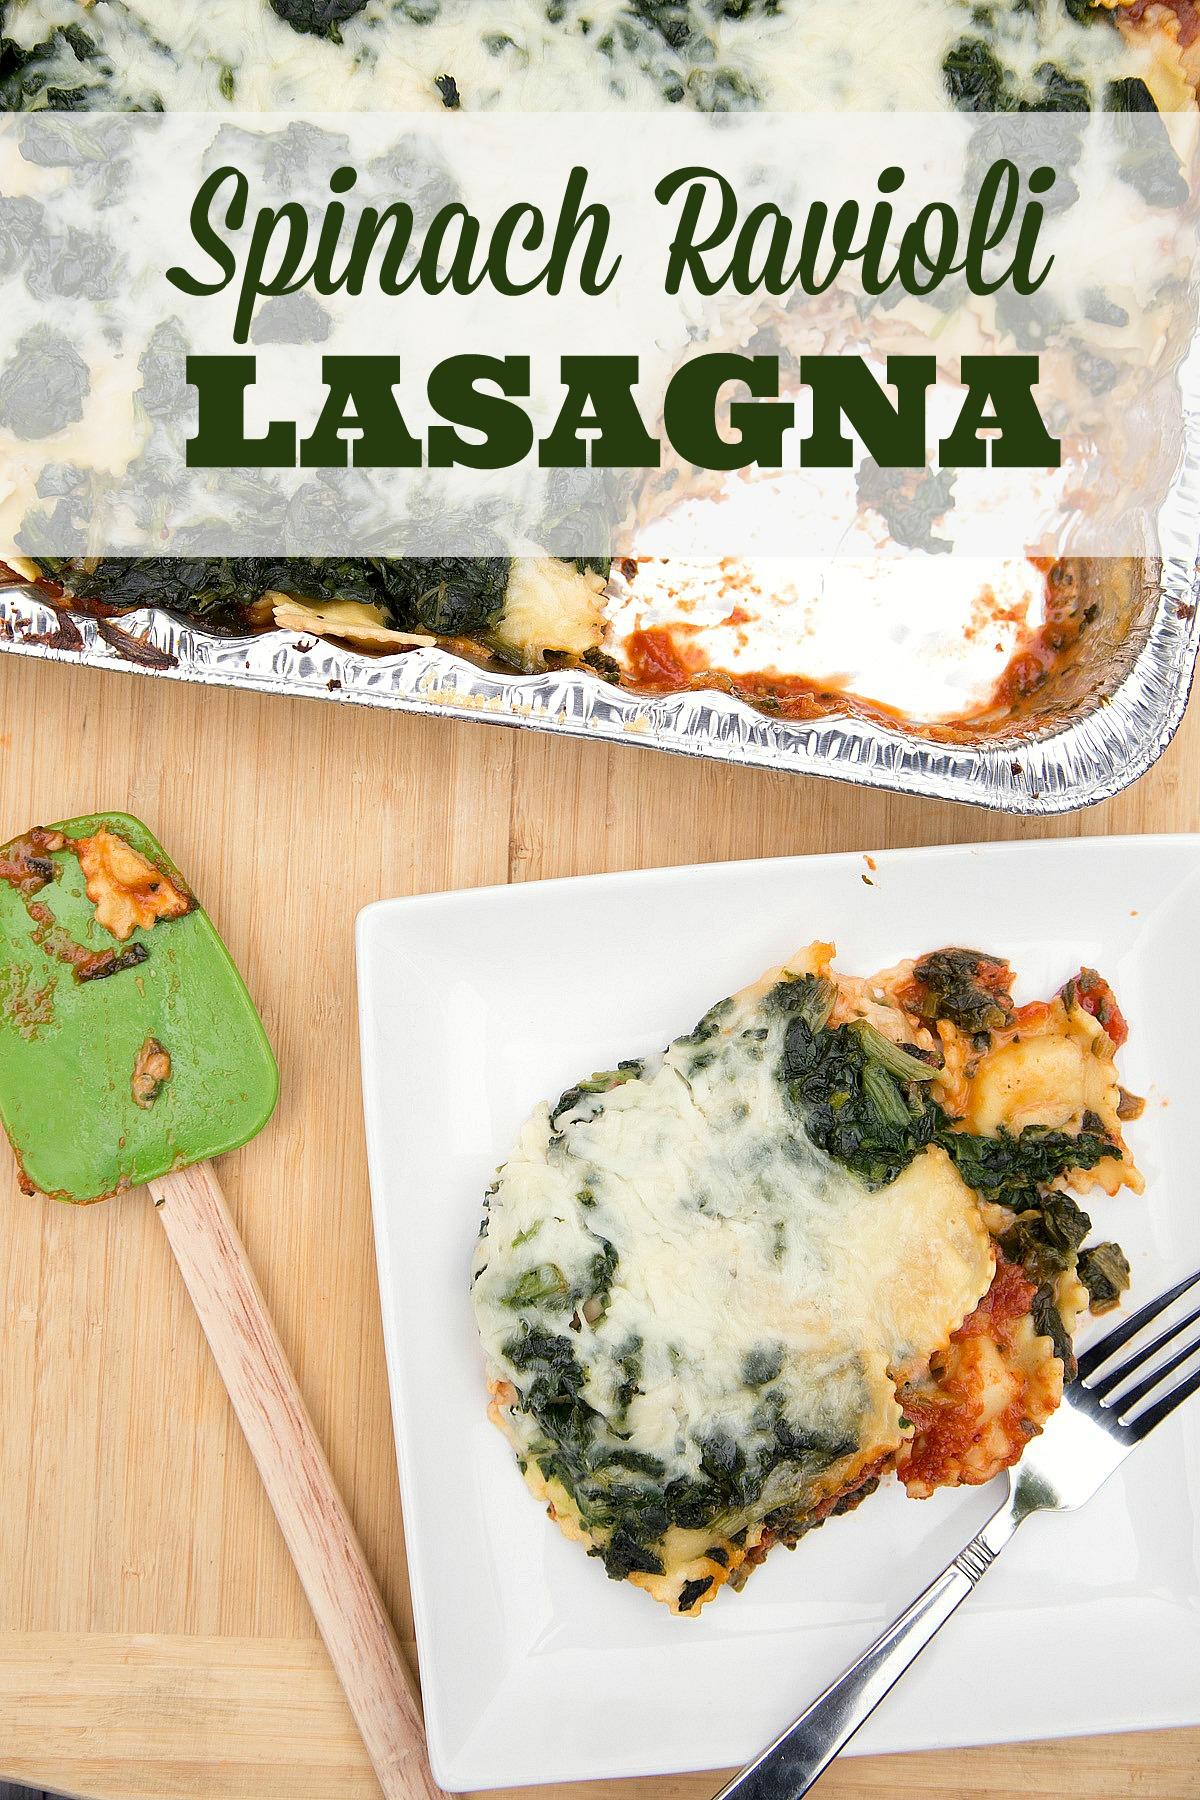 Spinach Ravioli Lasagna.... : $5 Dinners - howlDb